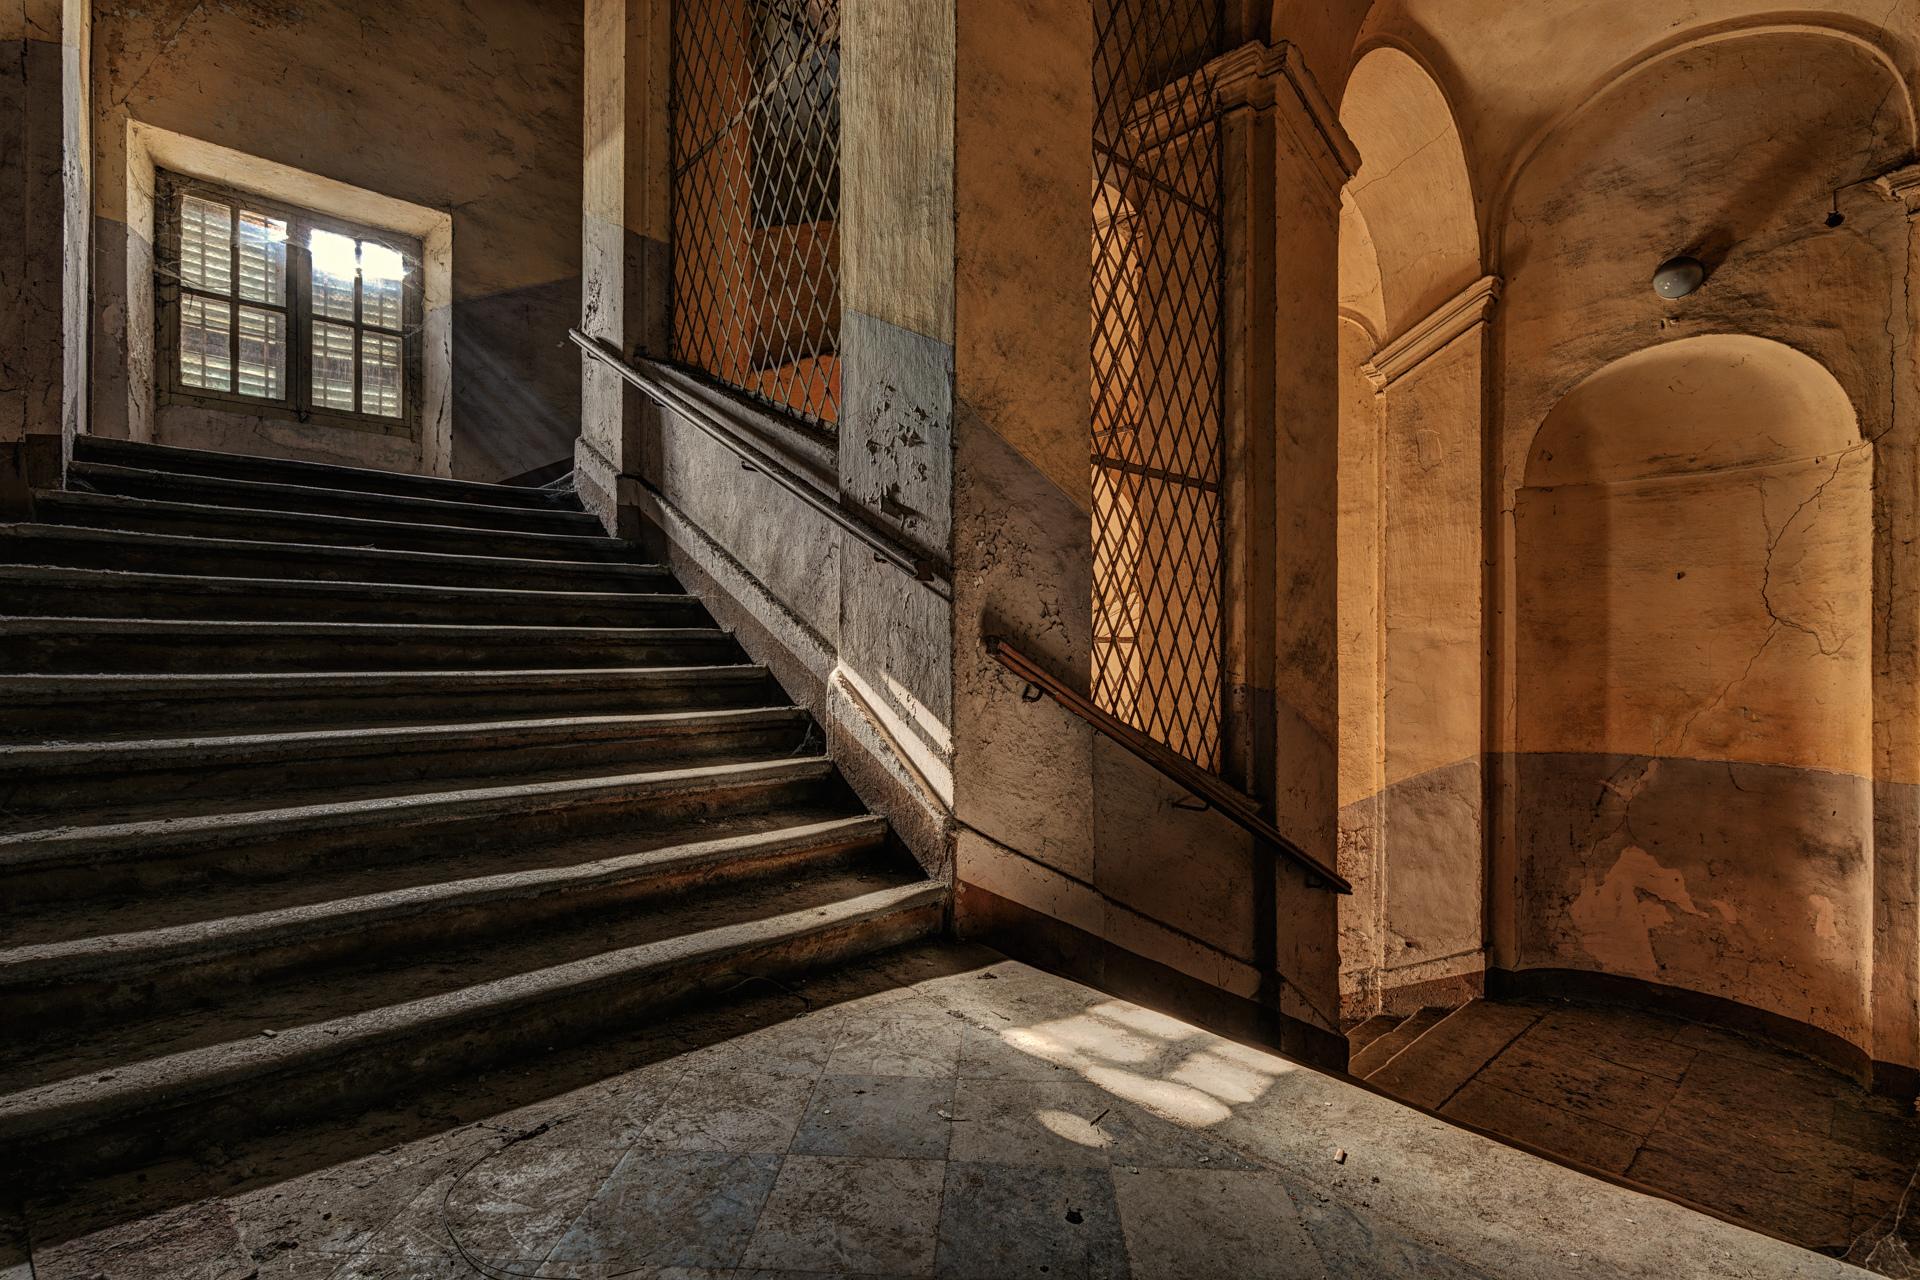 Urban Exploration - Manicomio Dr. Rossetti - Sunlit Staircase